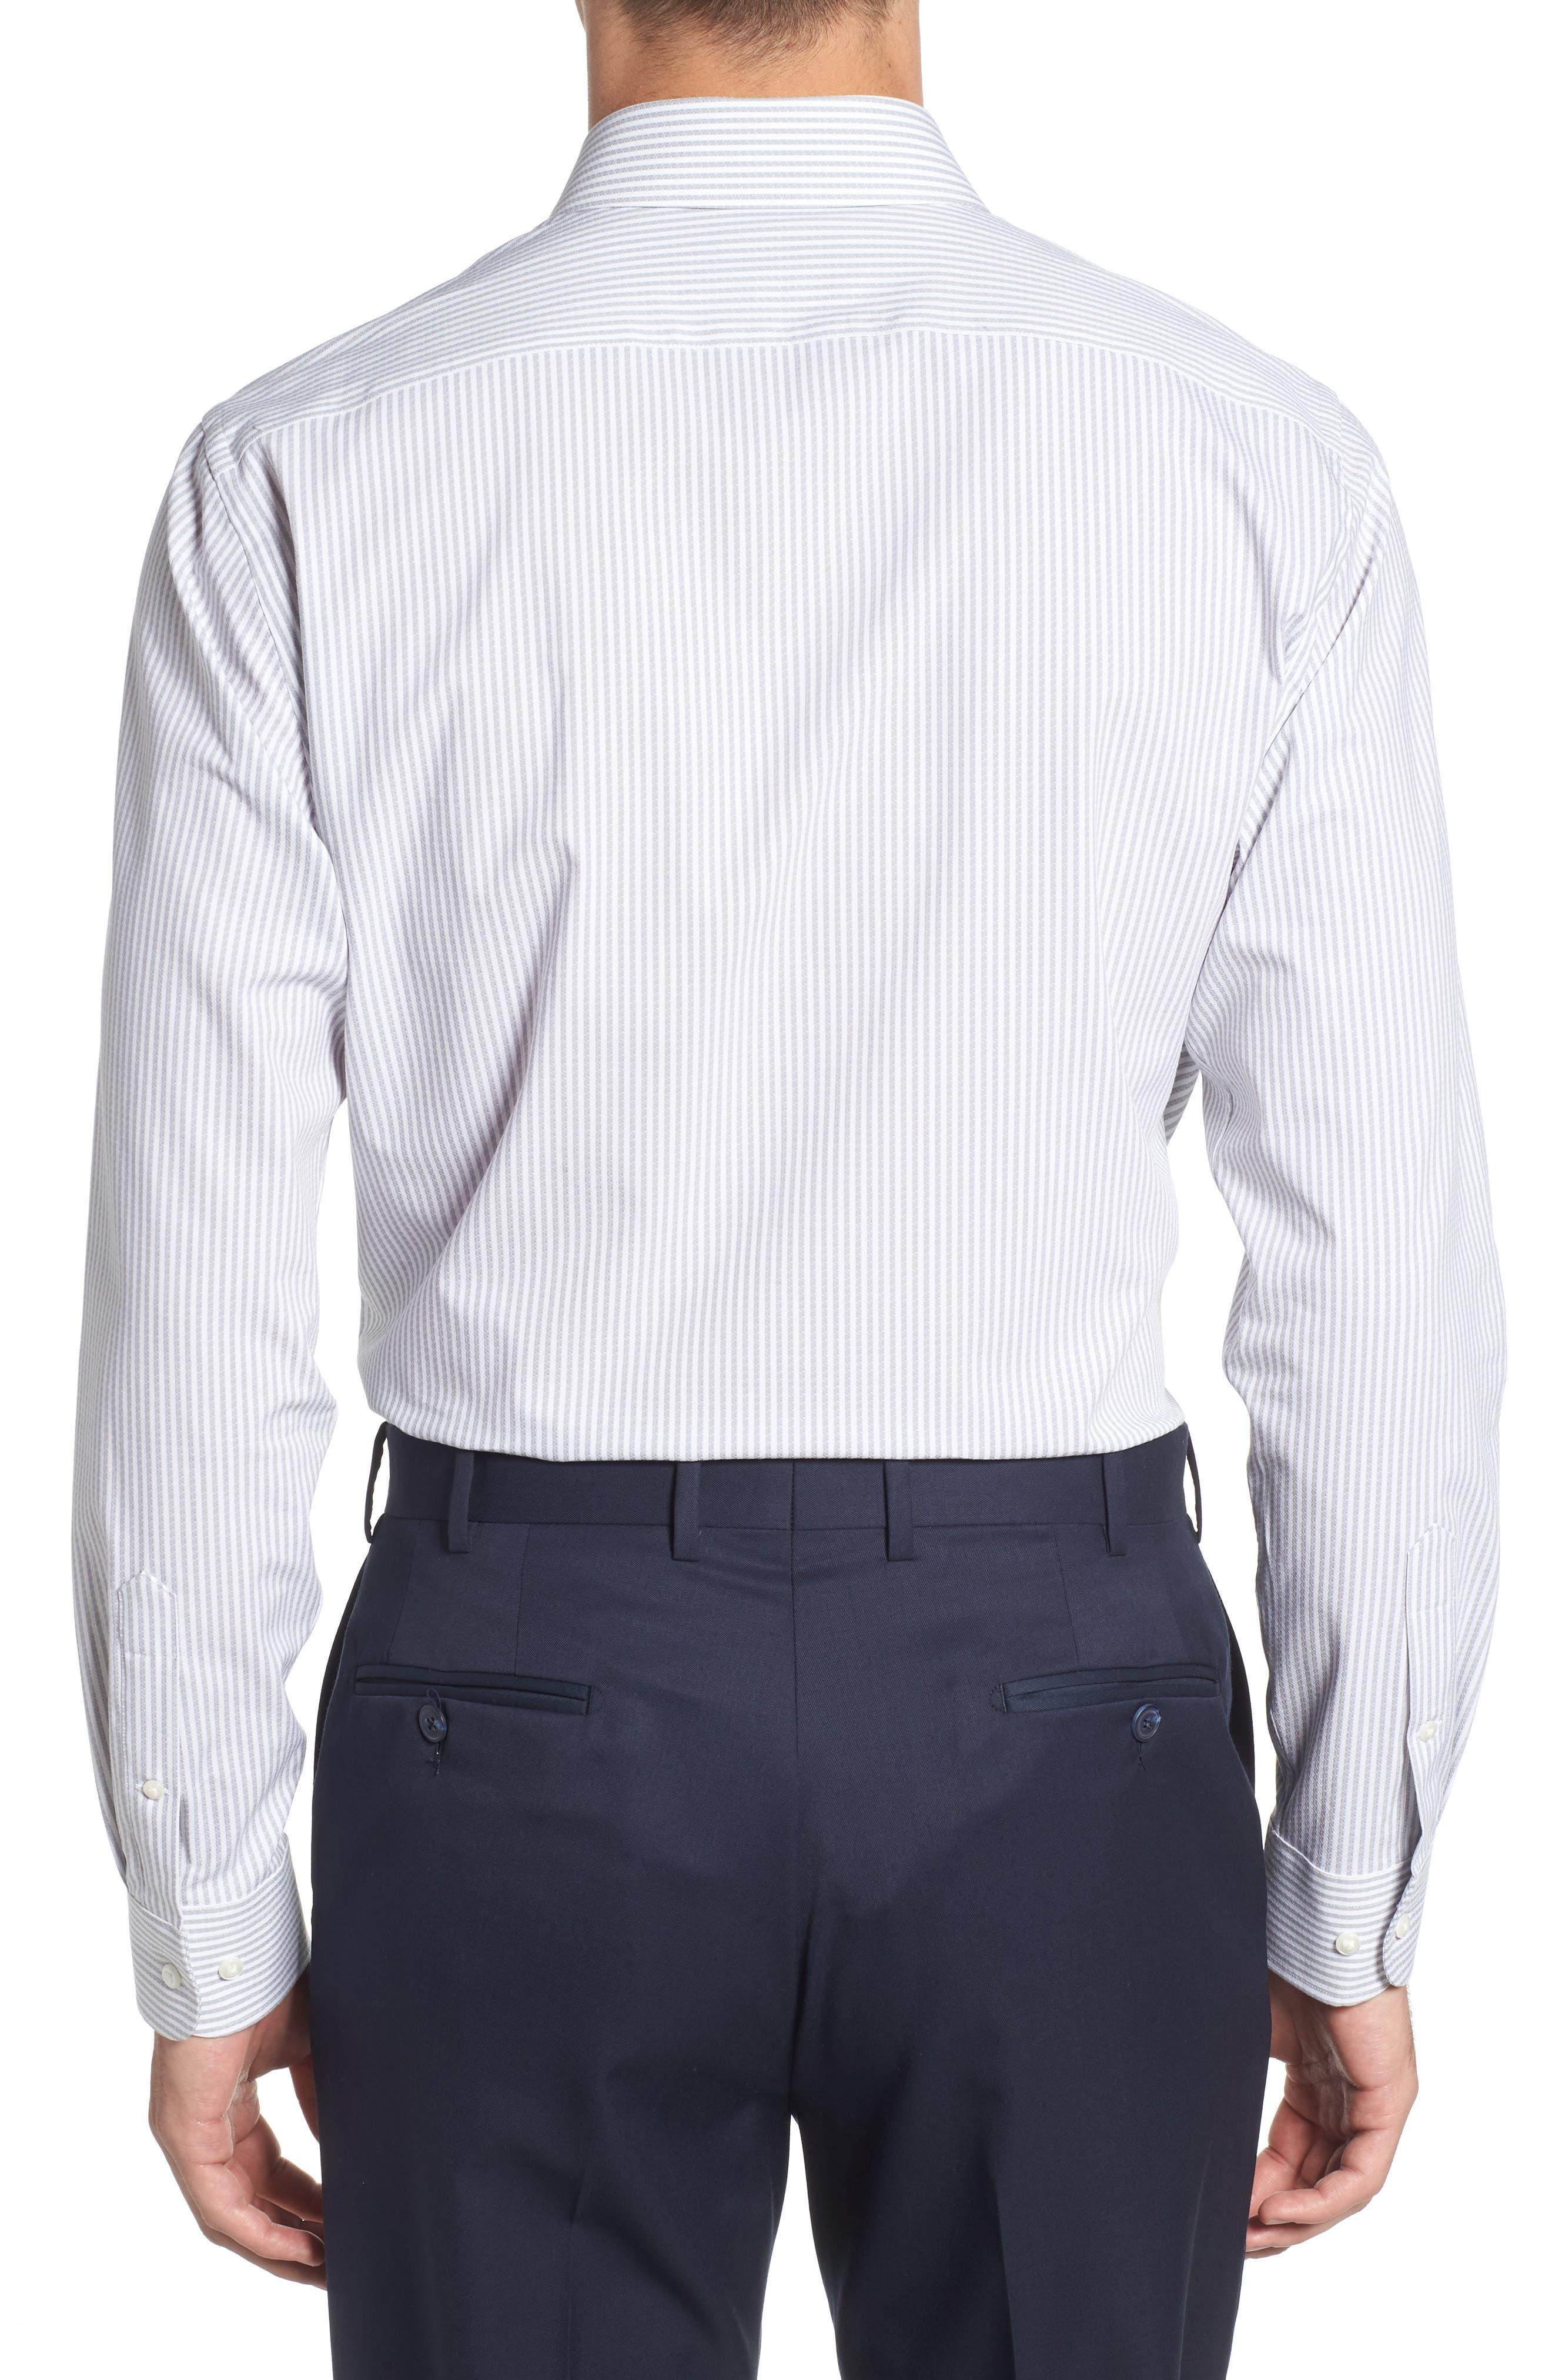 Tech-Smart Trim Fit Stripe Stretch Dress Shirt,                             Alternate thumbnail 3, color,                             050